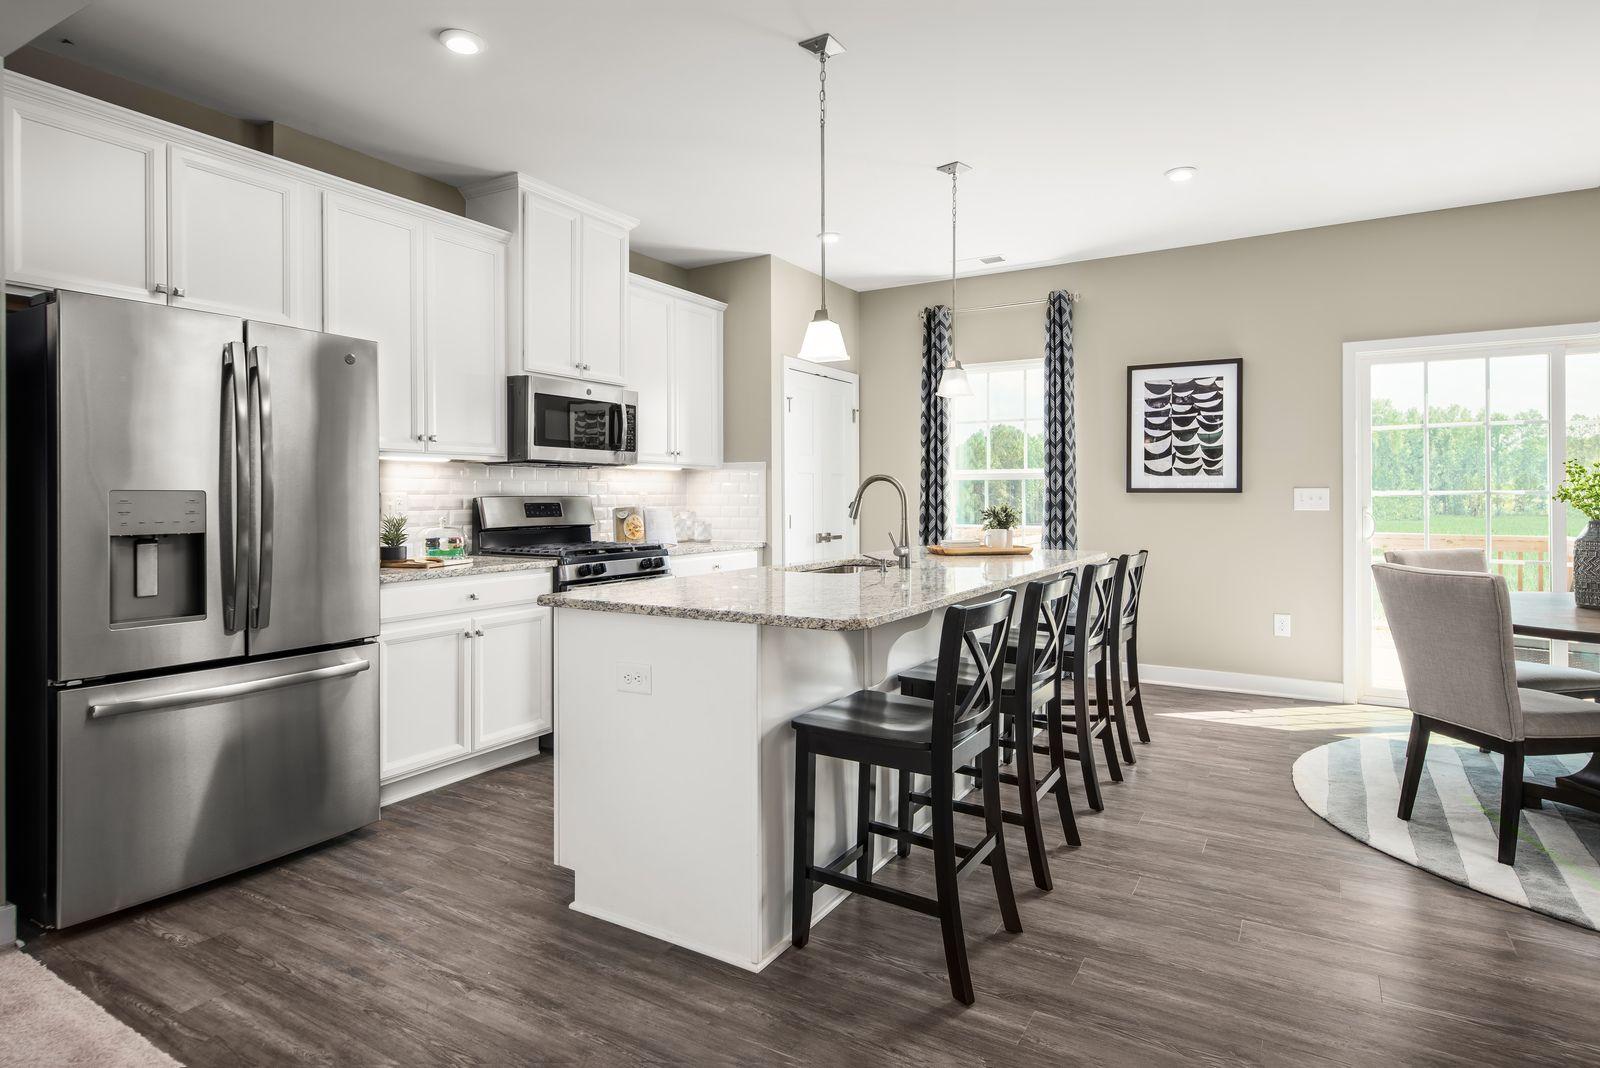 Kitchen featured in the Mendelssohn Front Entry Garage By Ryan Homes in Greenville-Spartanburg, SC